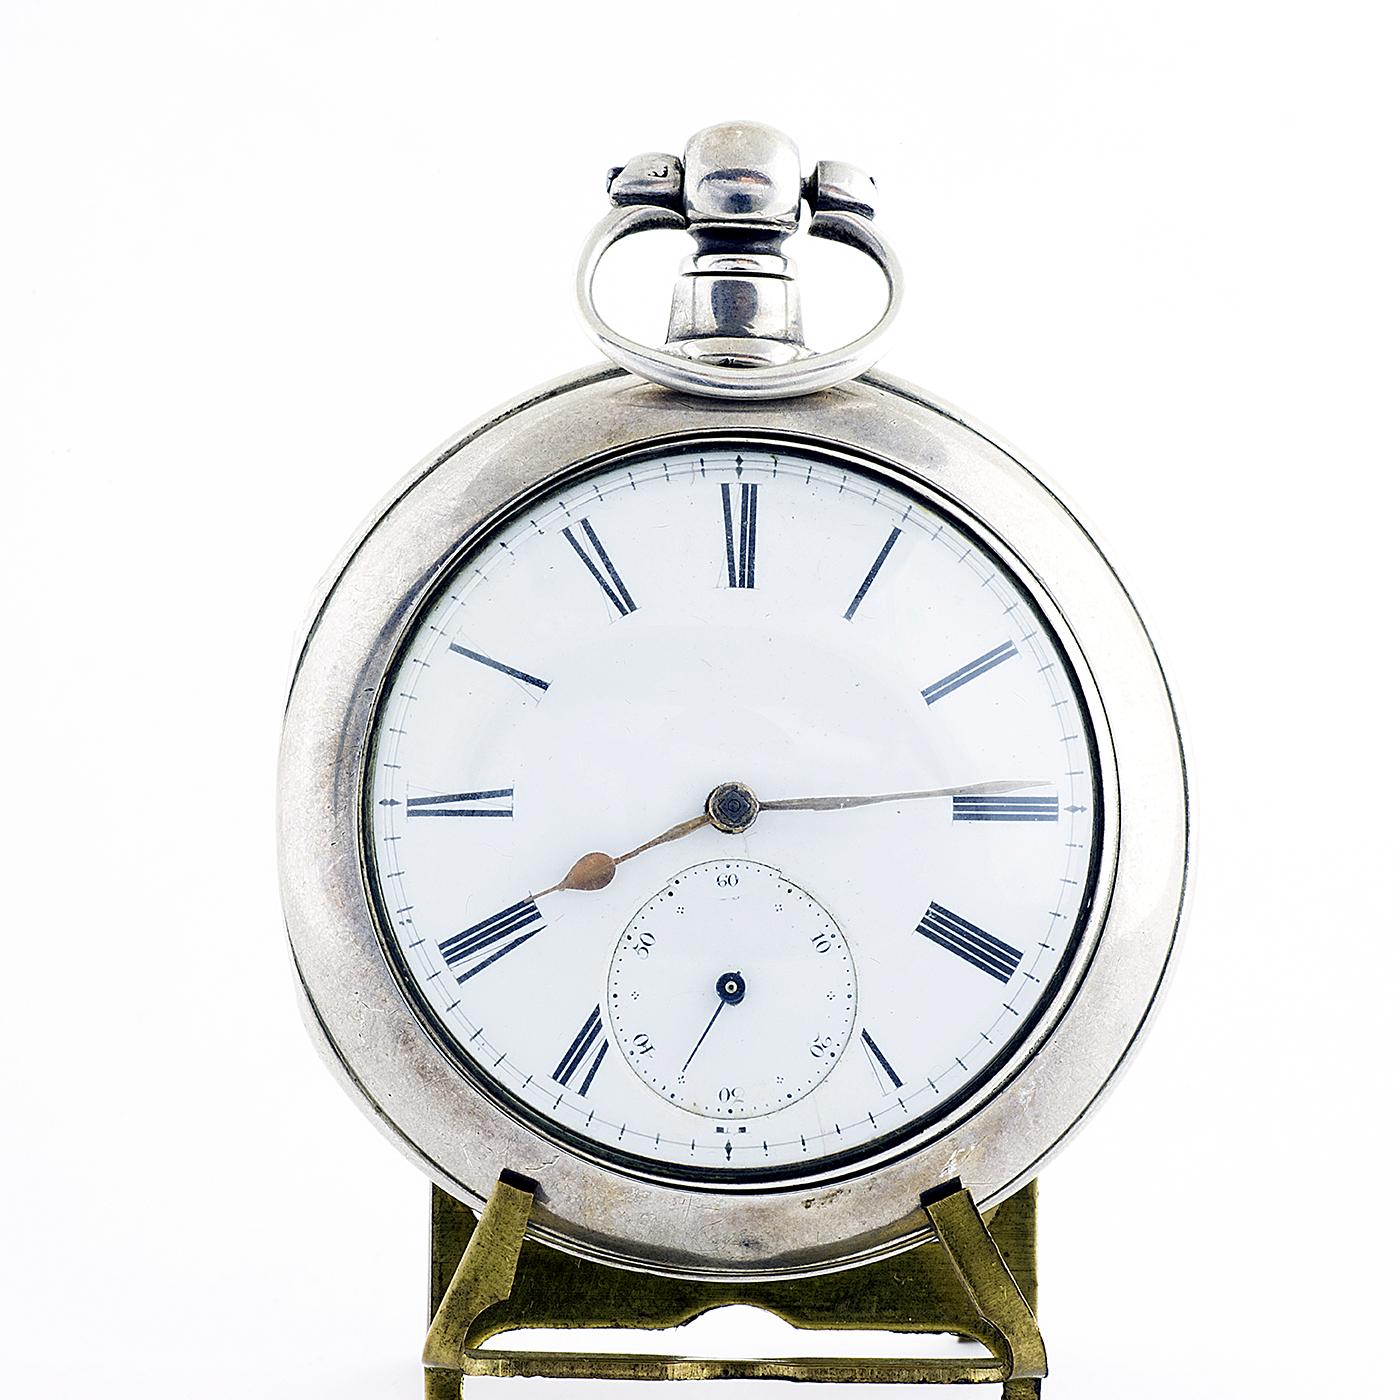 STEWART DAWSON AND COMPANY (Liverpool). Reloj de Bolsillo para caballero, lepine. Birminghan, 1890.